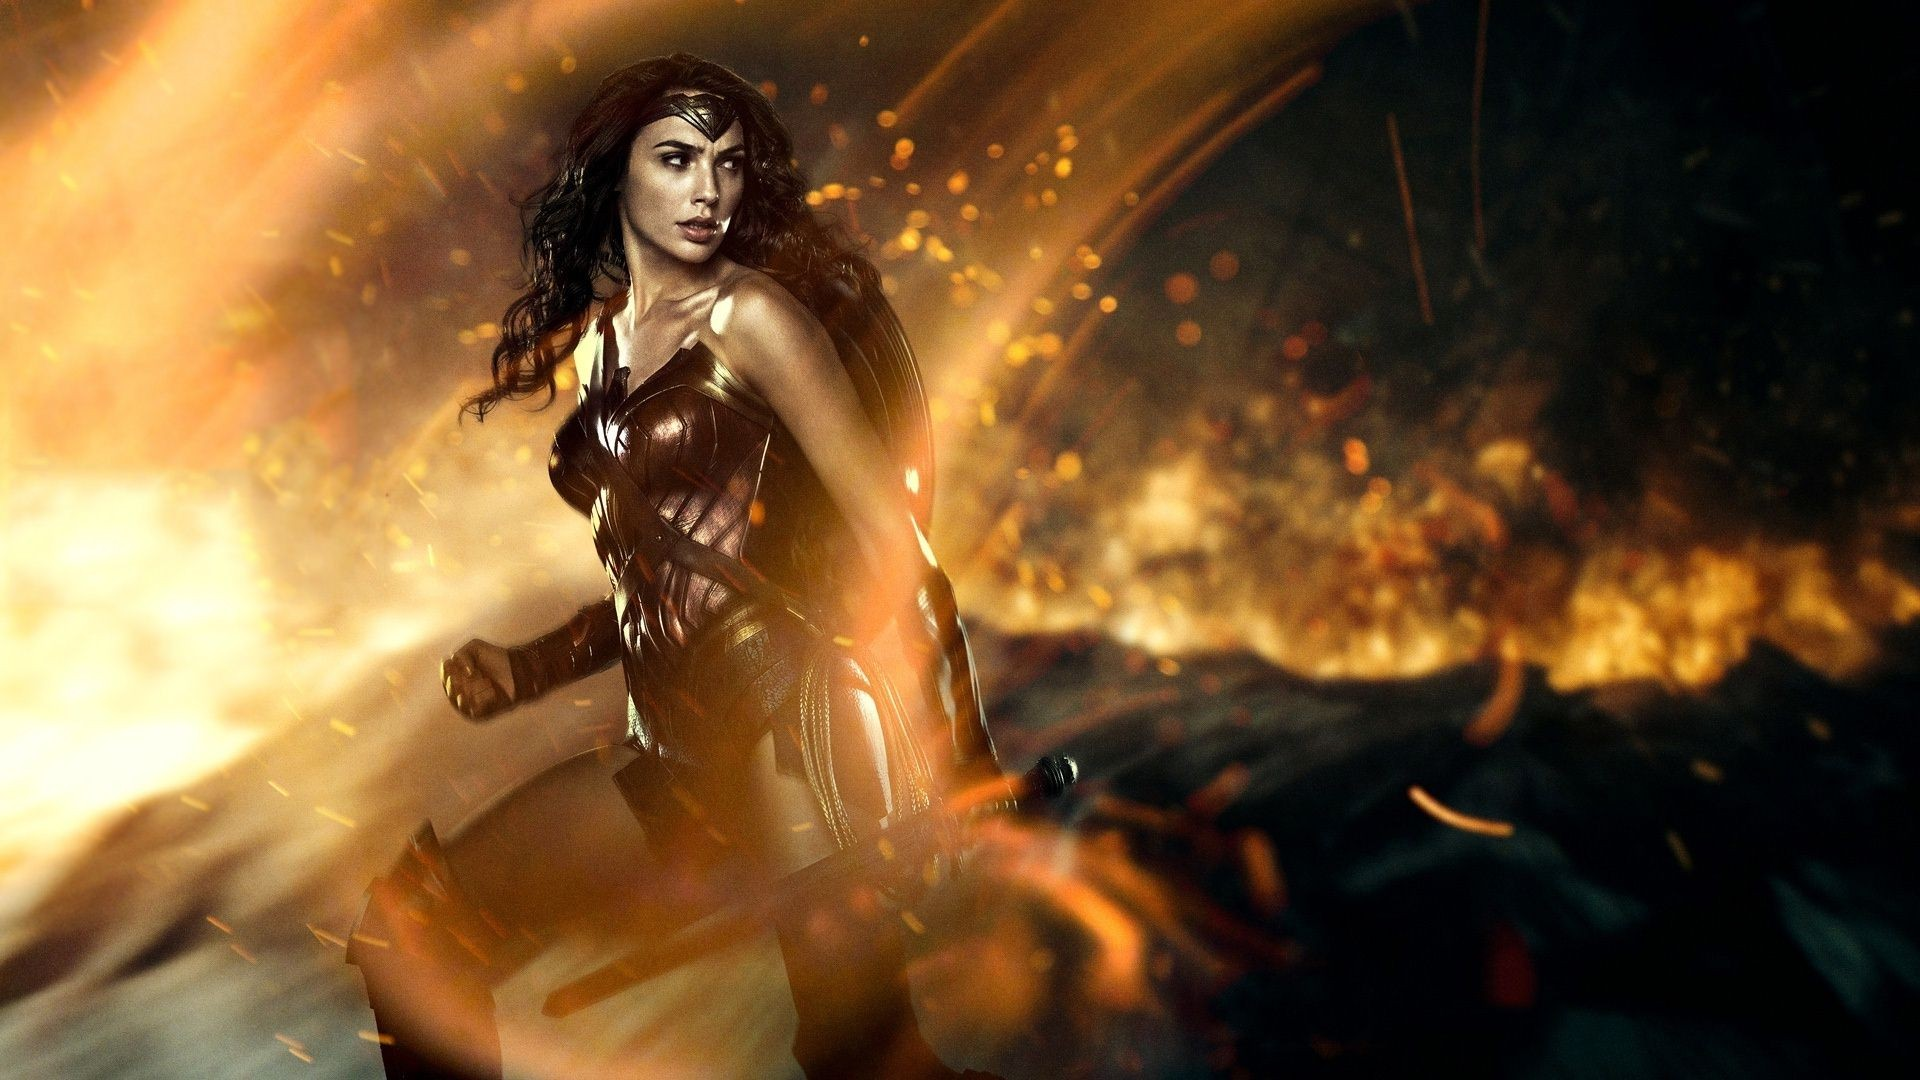 Wonder Woman Wallpaper Download Free Amazing Wallpapers Of